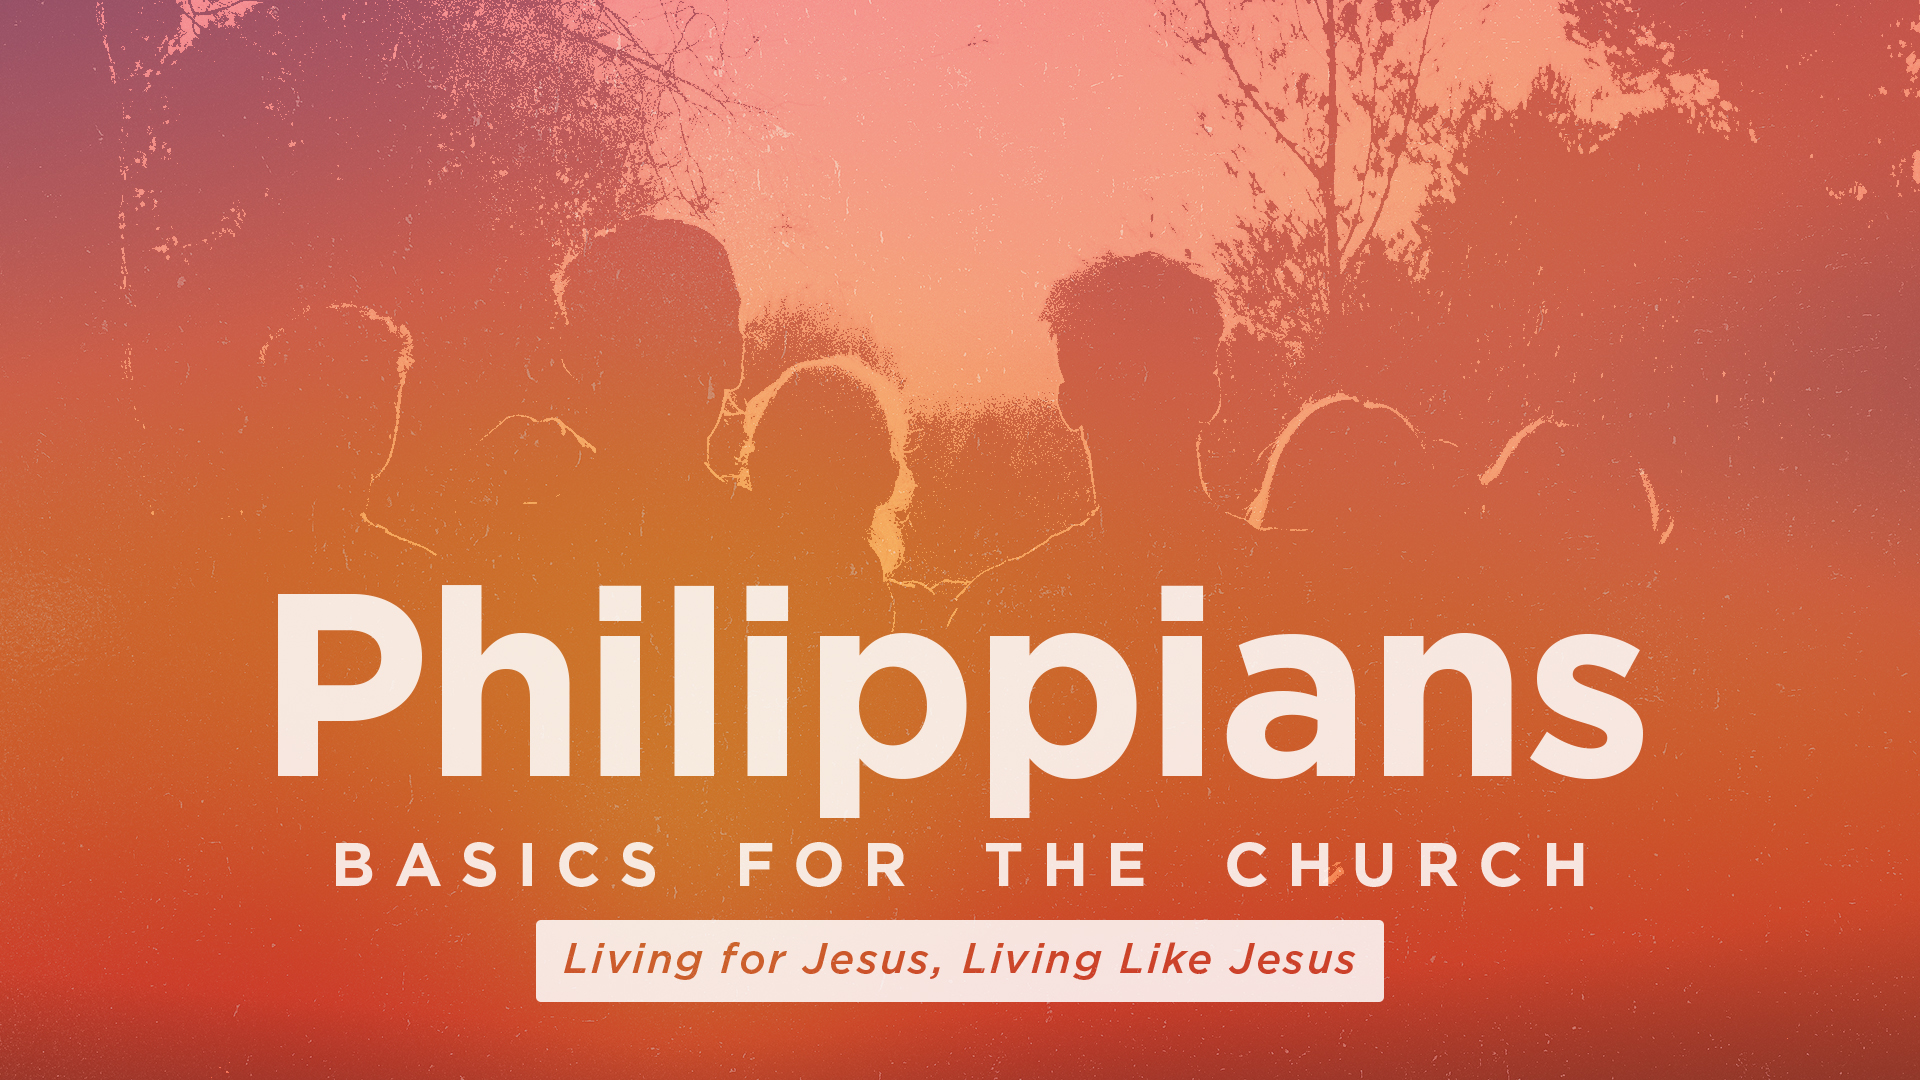 Philippians-Main-Title-HD